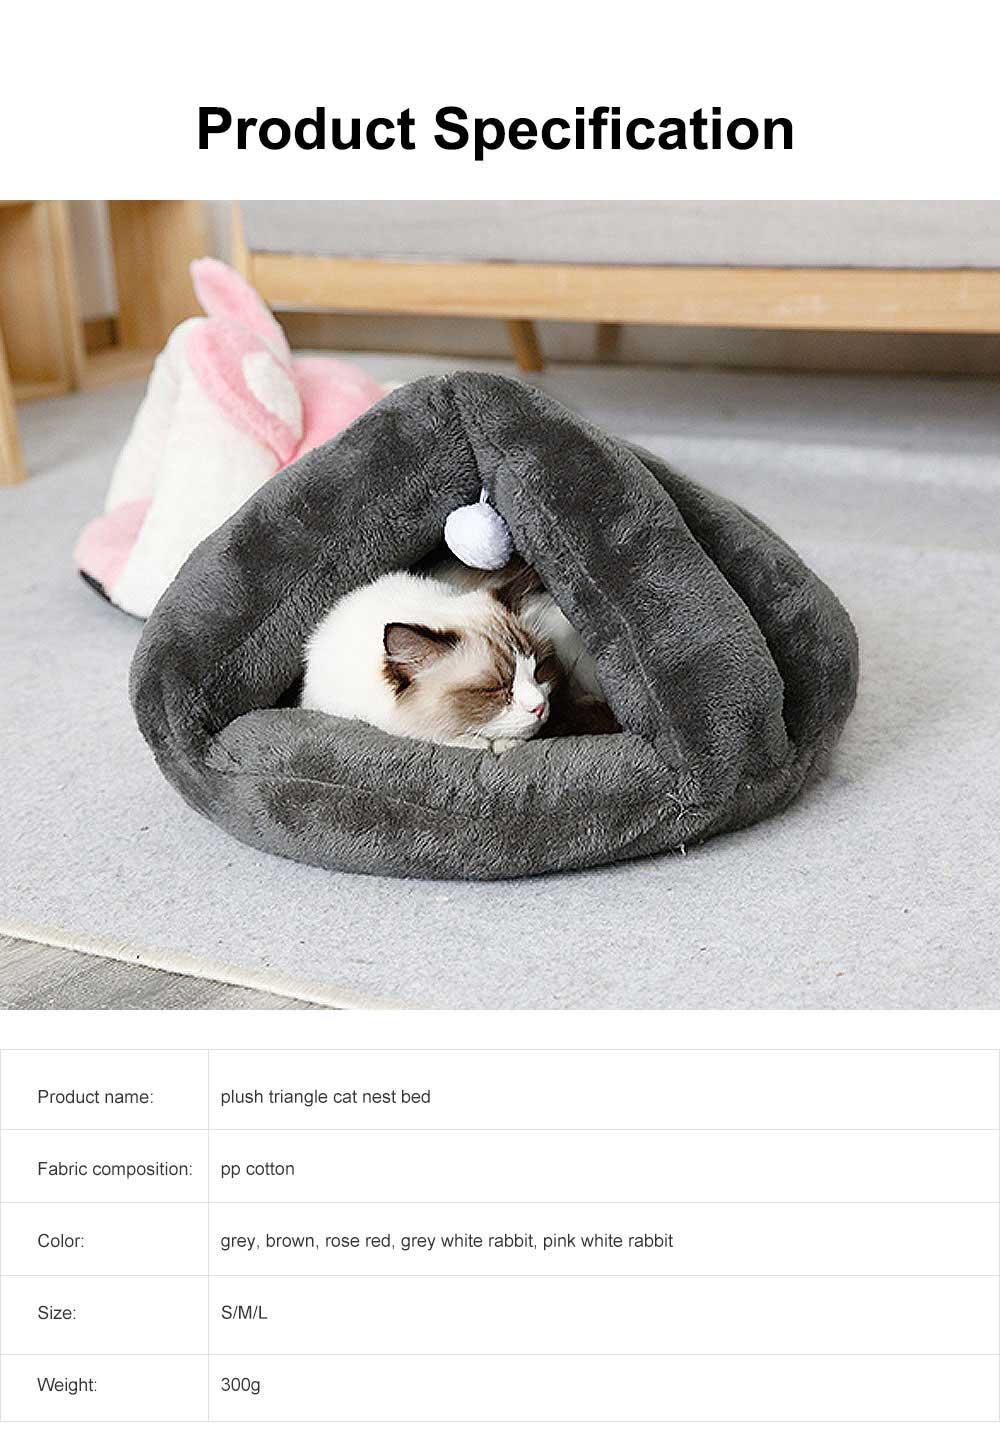 Plush Triangle Cat Nest Bed, Keep Warm Cat Nesting Dolls, Luxury Cotton Kitty Nest 6